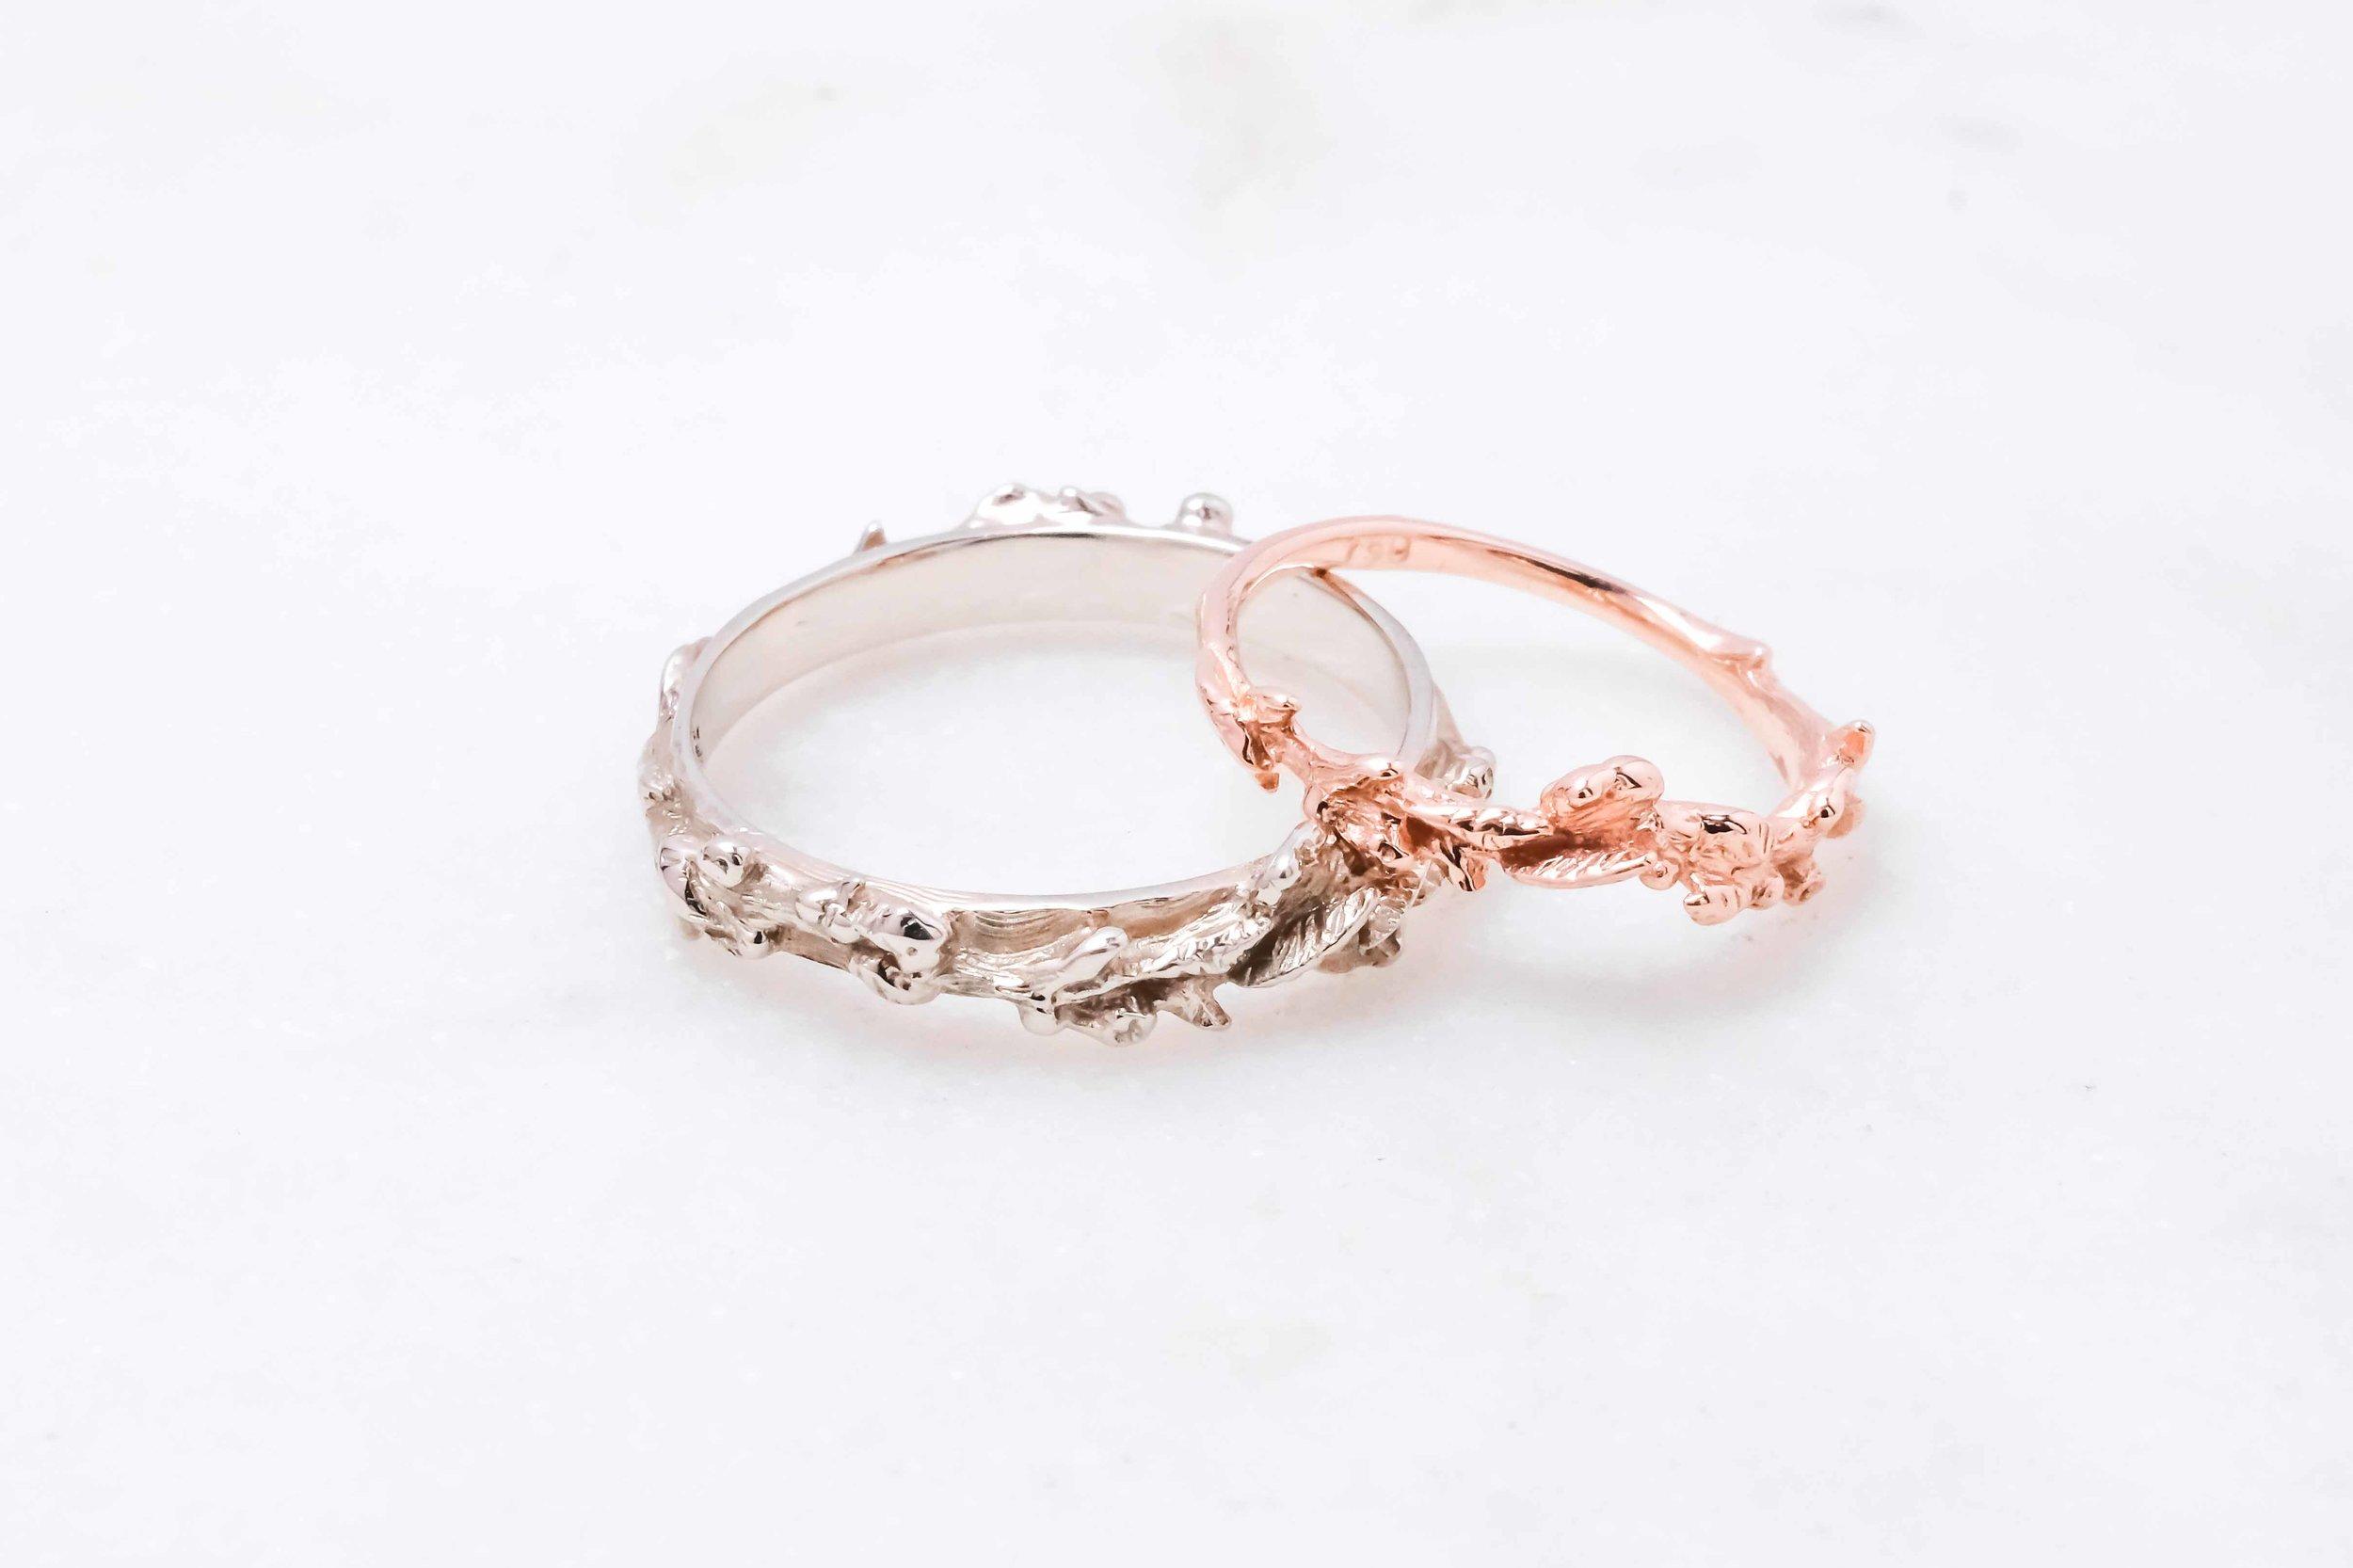 women-men-wedding-ring-custom-sur-mesure-alliances-the-black-alchemy-2